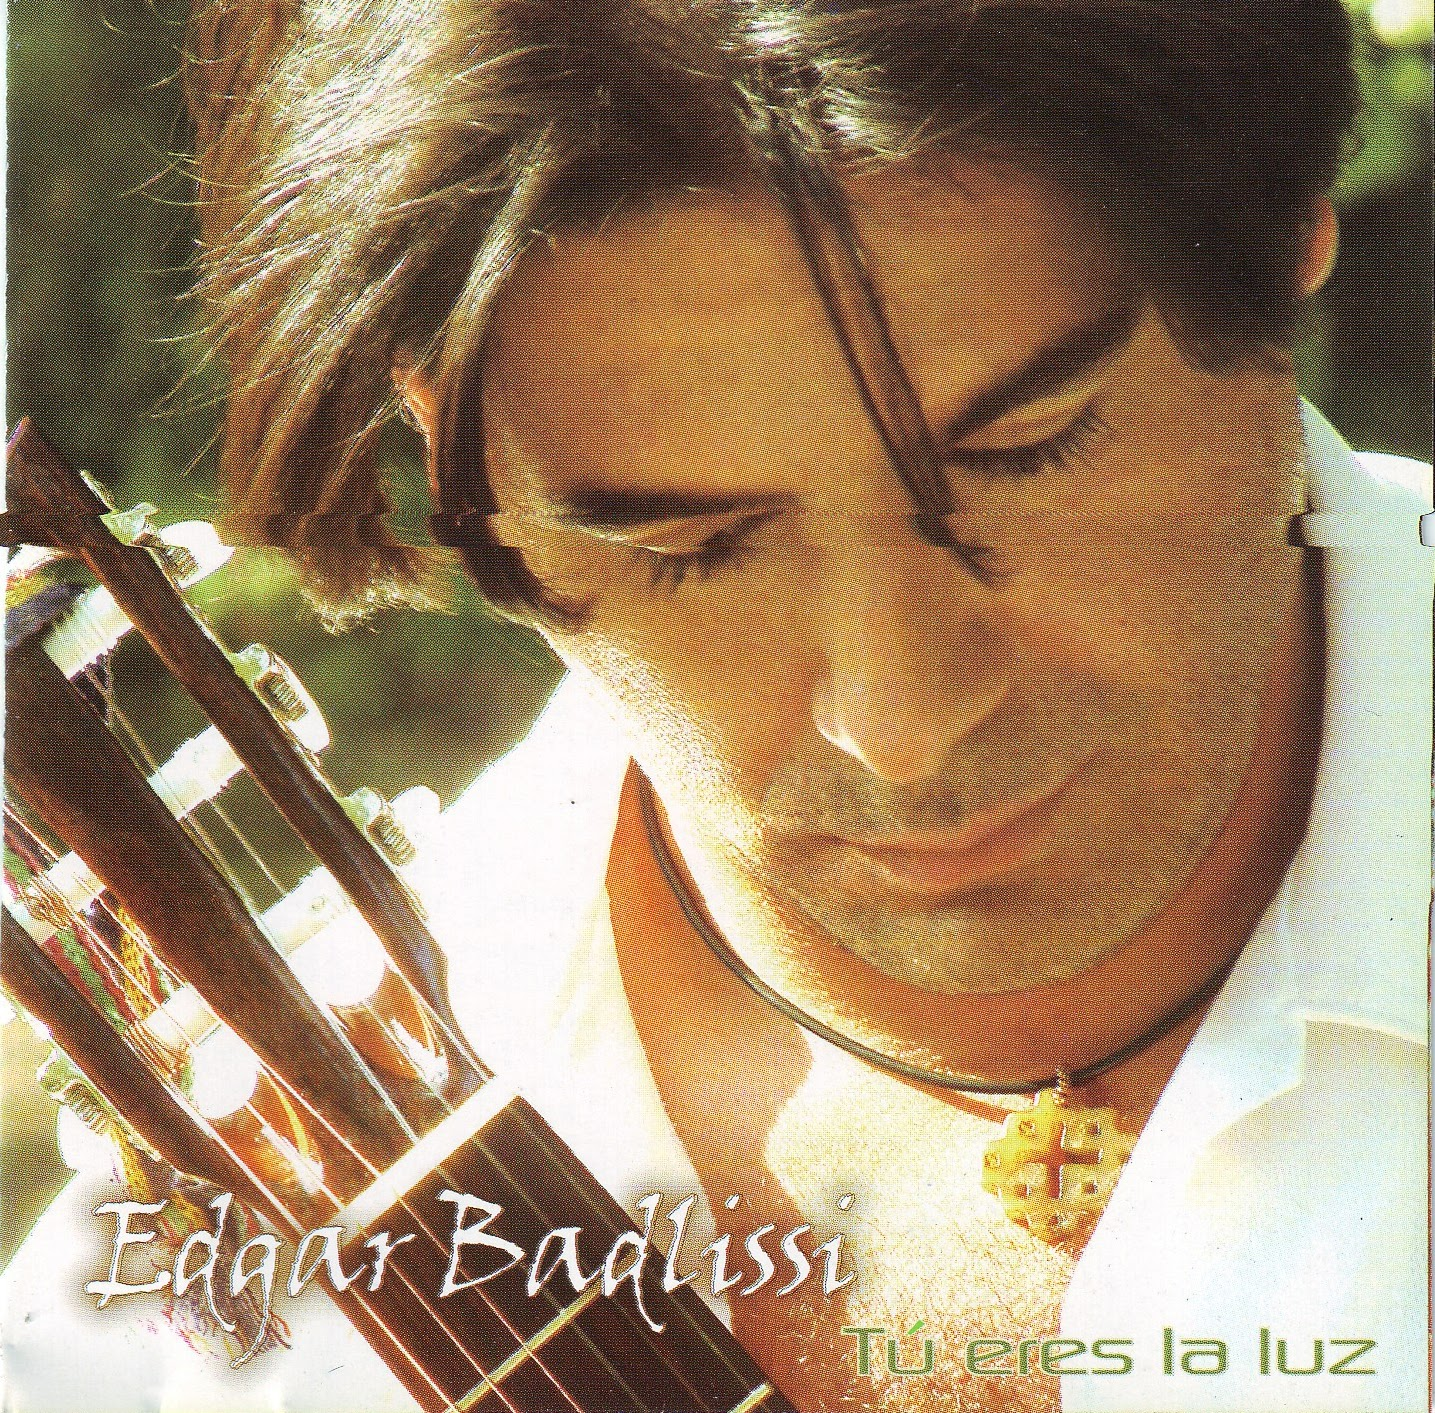 Edgar Badlissi-Tu Eres La Luz-